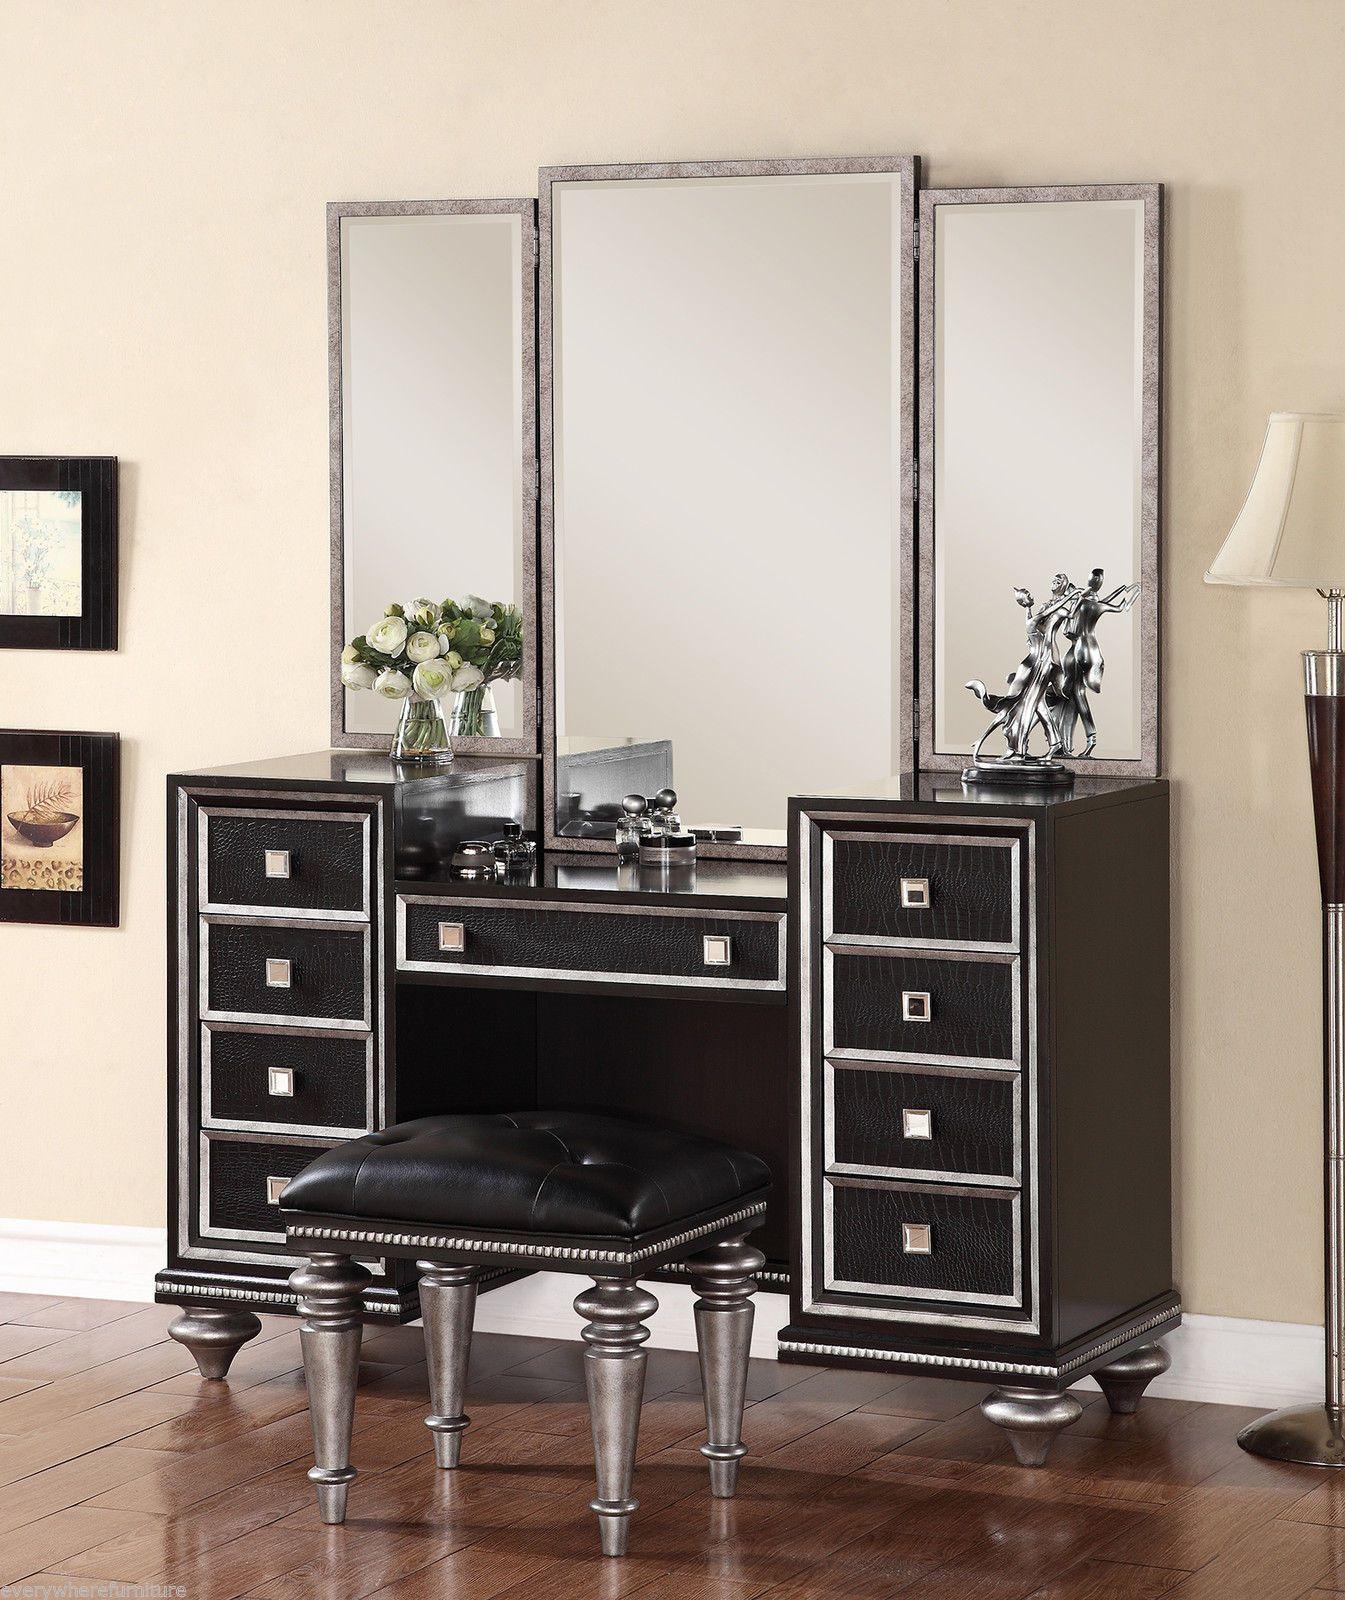 bedroom wiring diagram trane furnace wynwood furniture mirrors free download